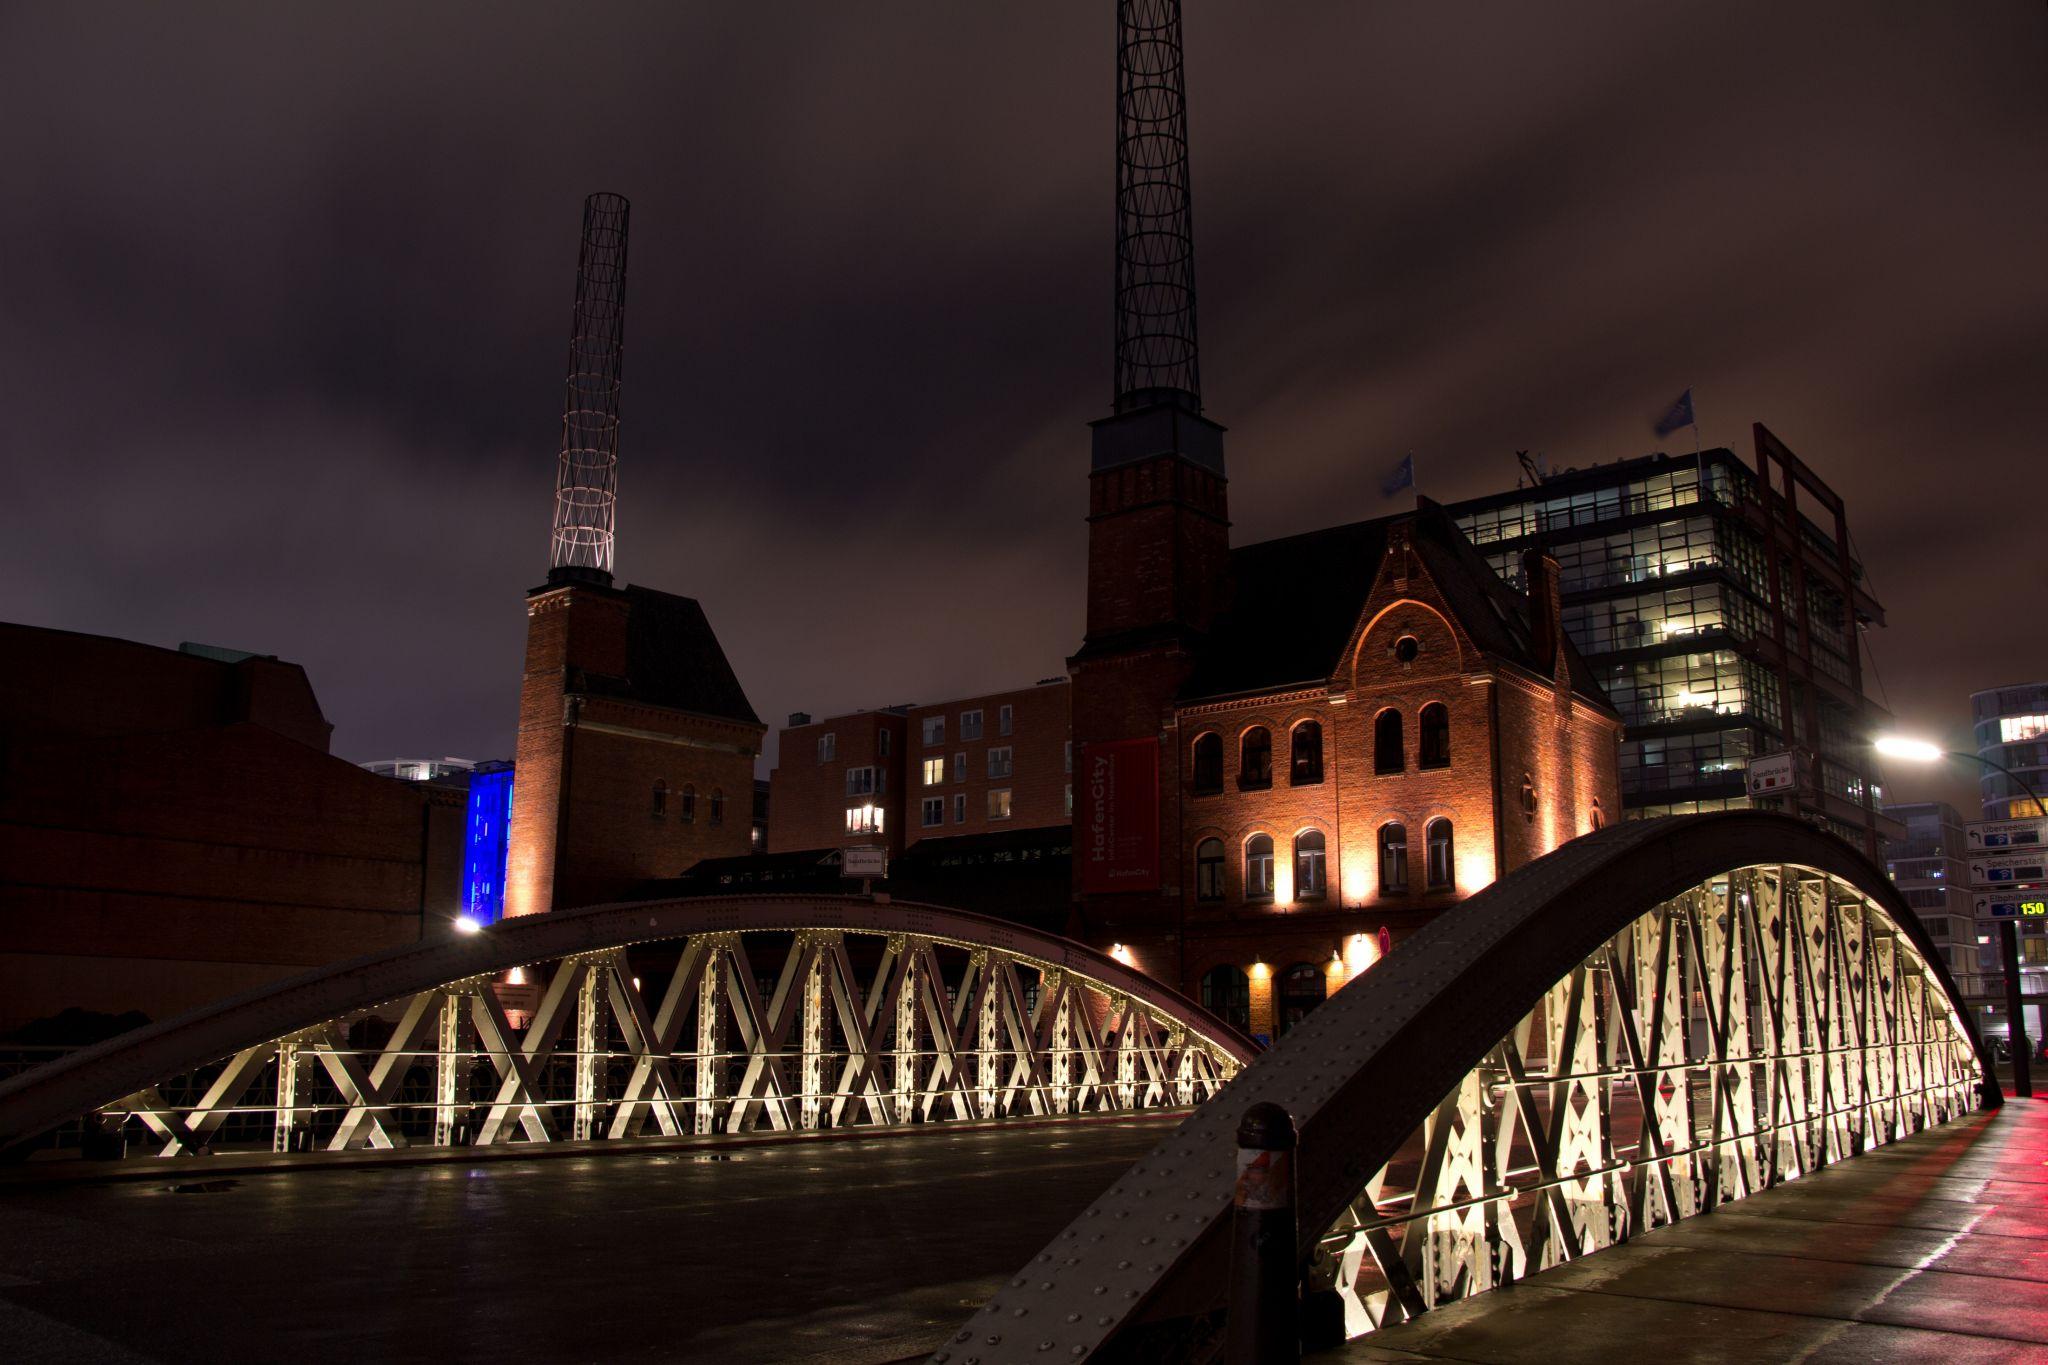 Hamburg Sandbrücke/Kesselhaus, Germany